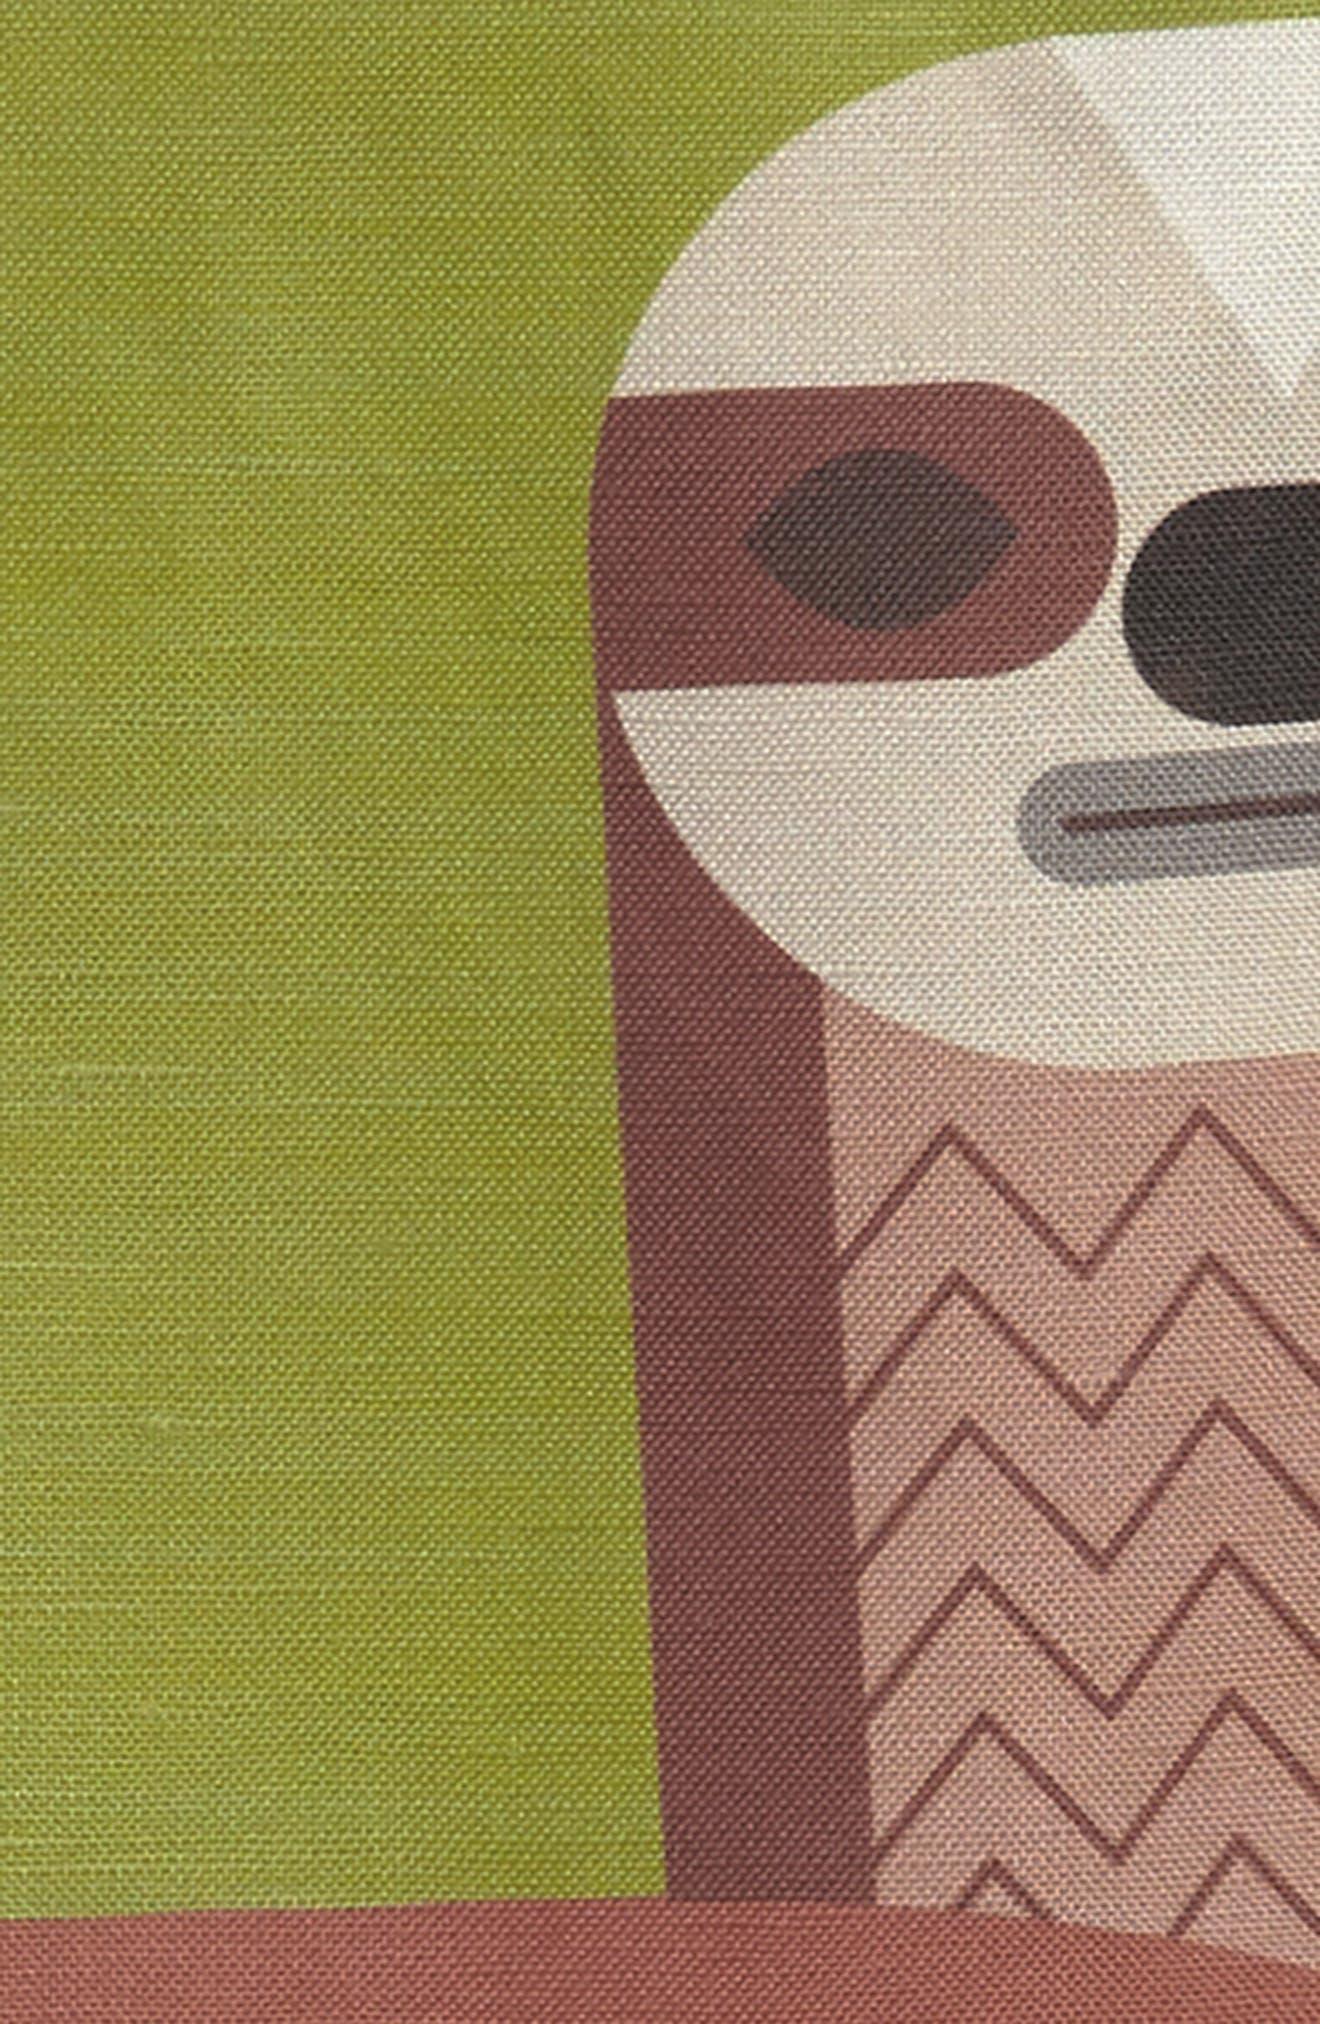 Sloth Shift Dress,                             Alternate thumbnail 3, color,                             Fern